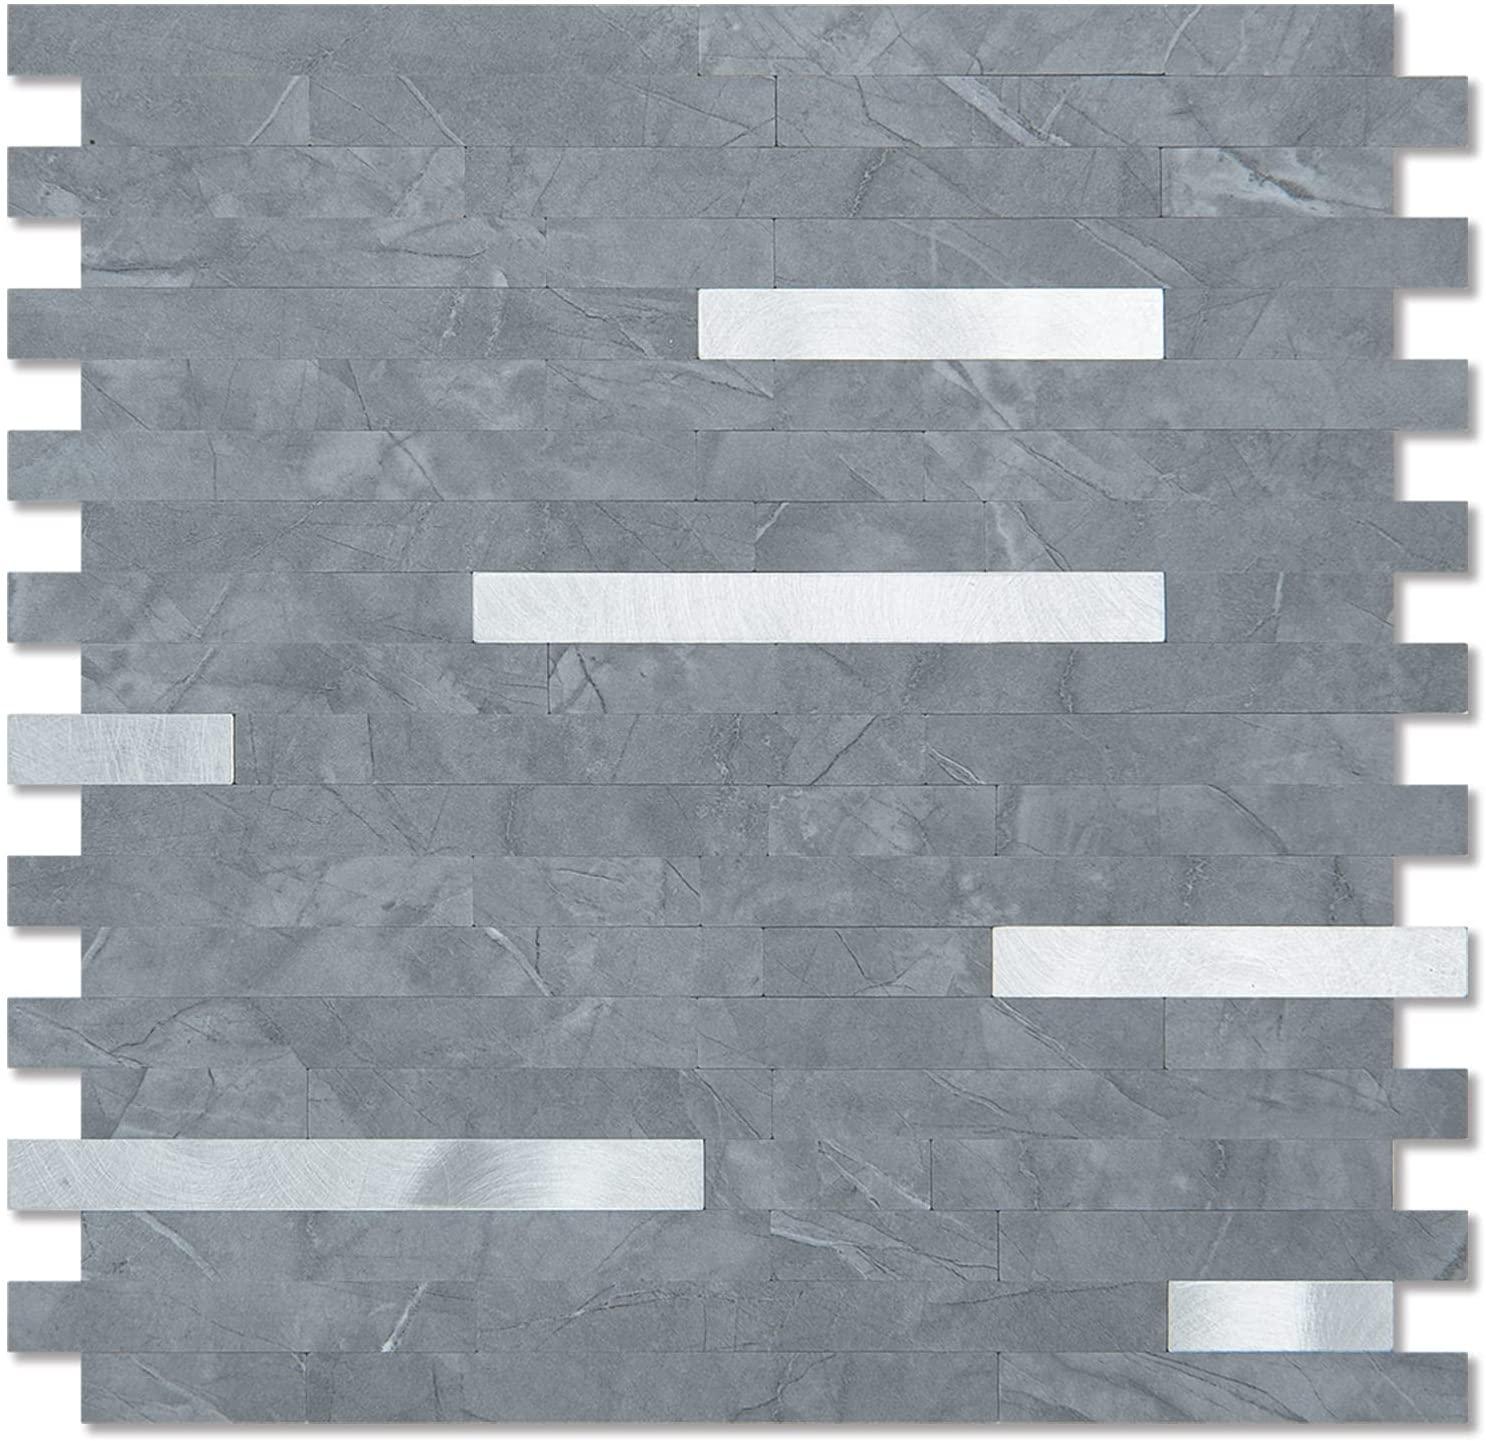 A16611-Art3d 10-Sheet Peel and Stick Stone Backsplash Tile for Kitchen, Bathroom - Volakas White Embellished with Metal Silver